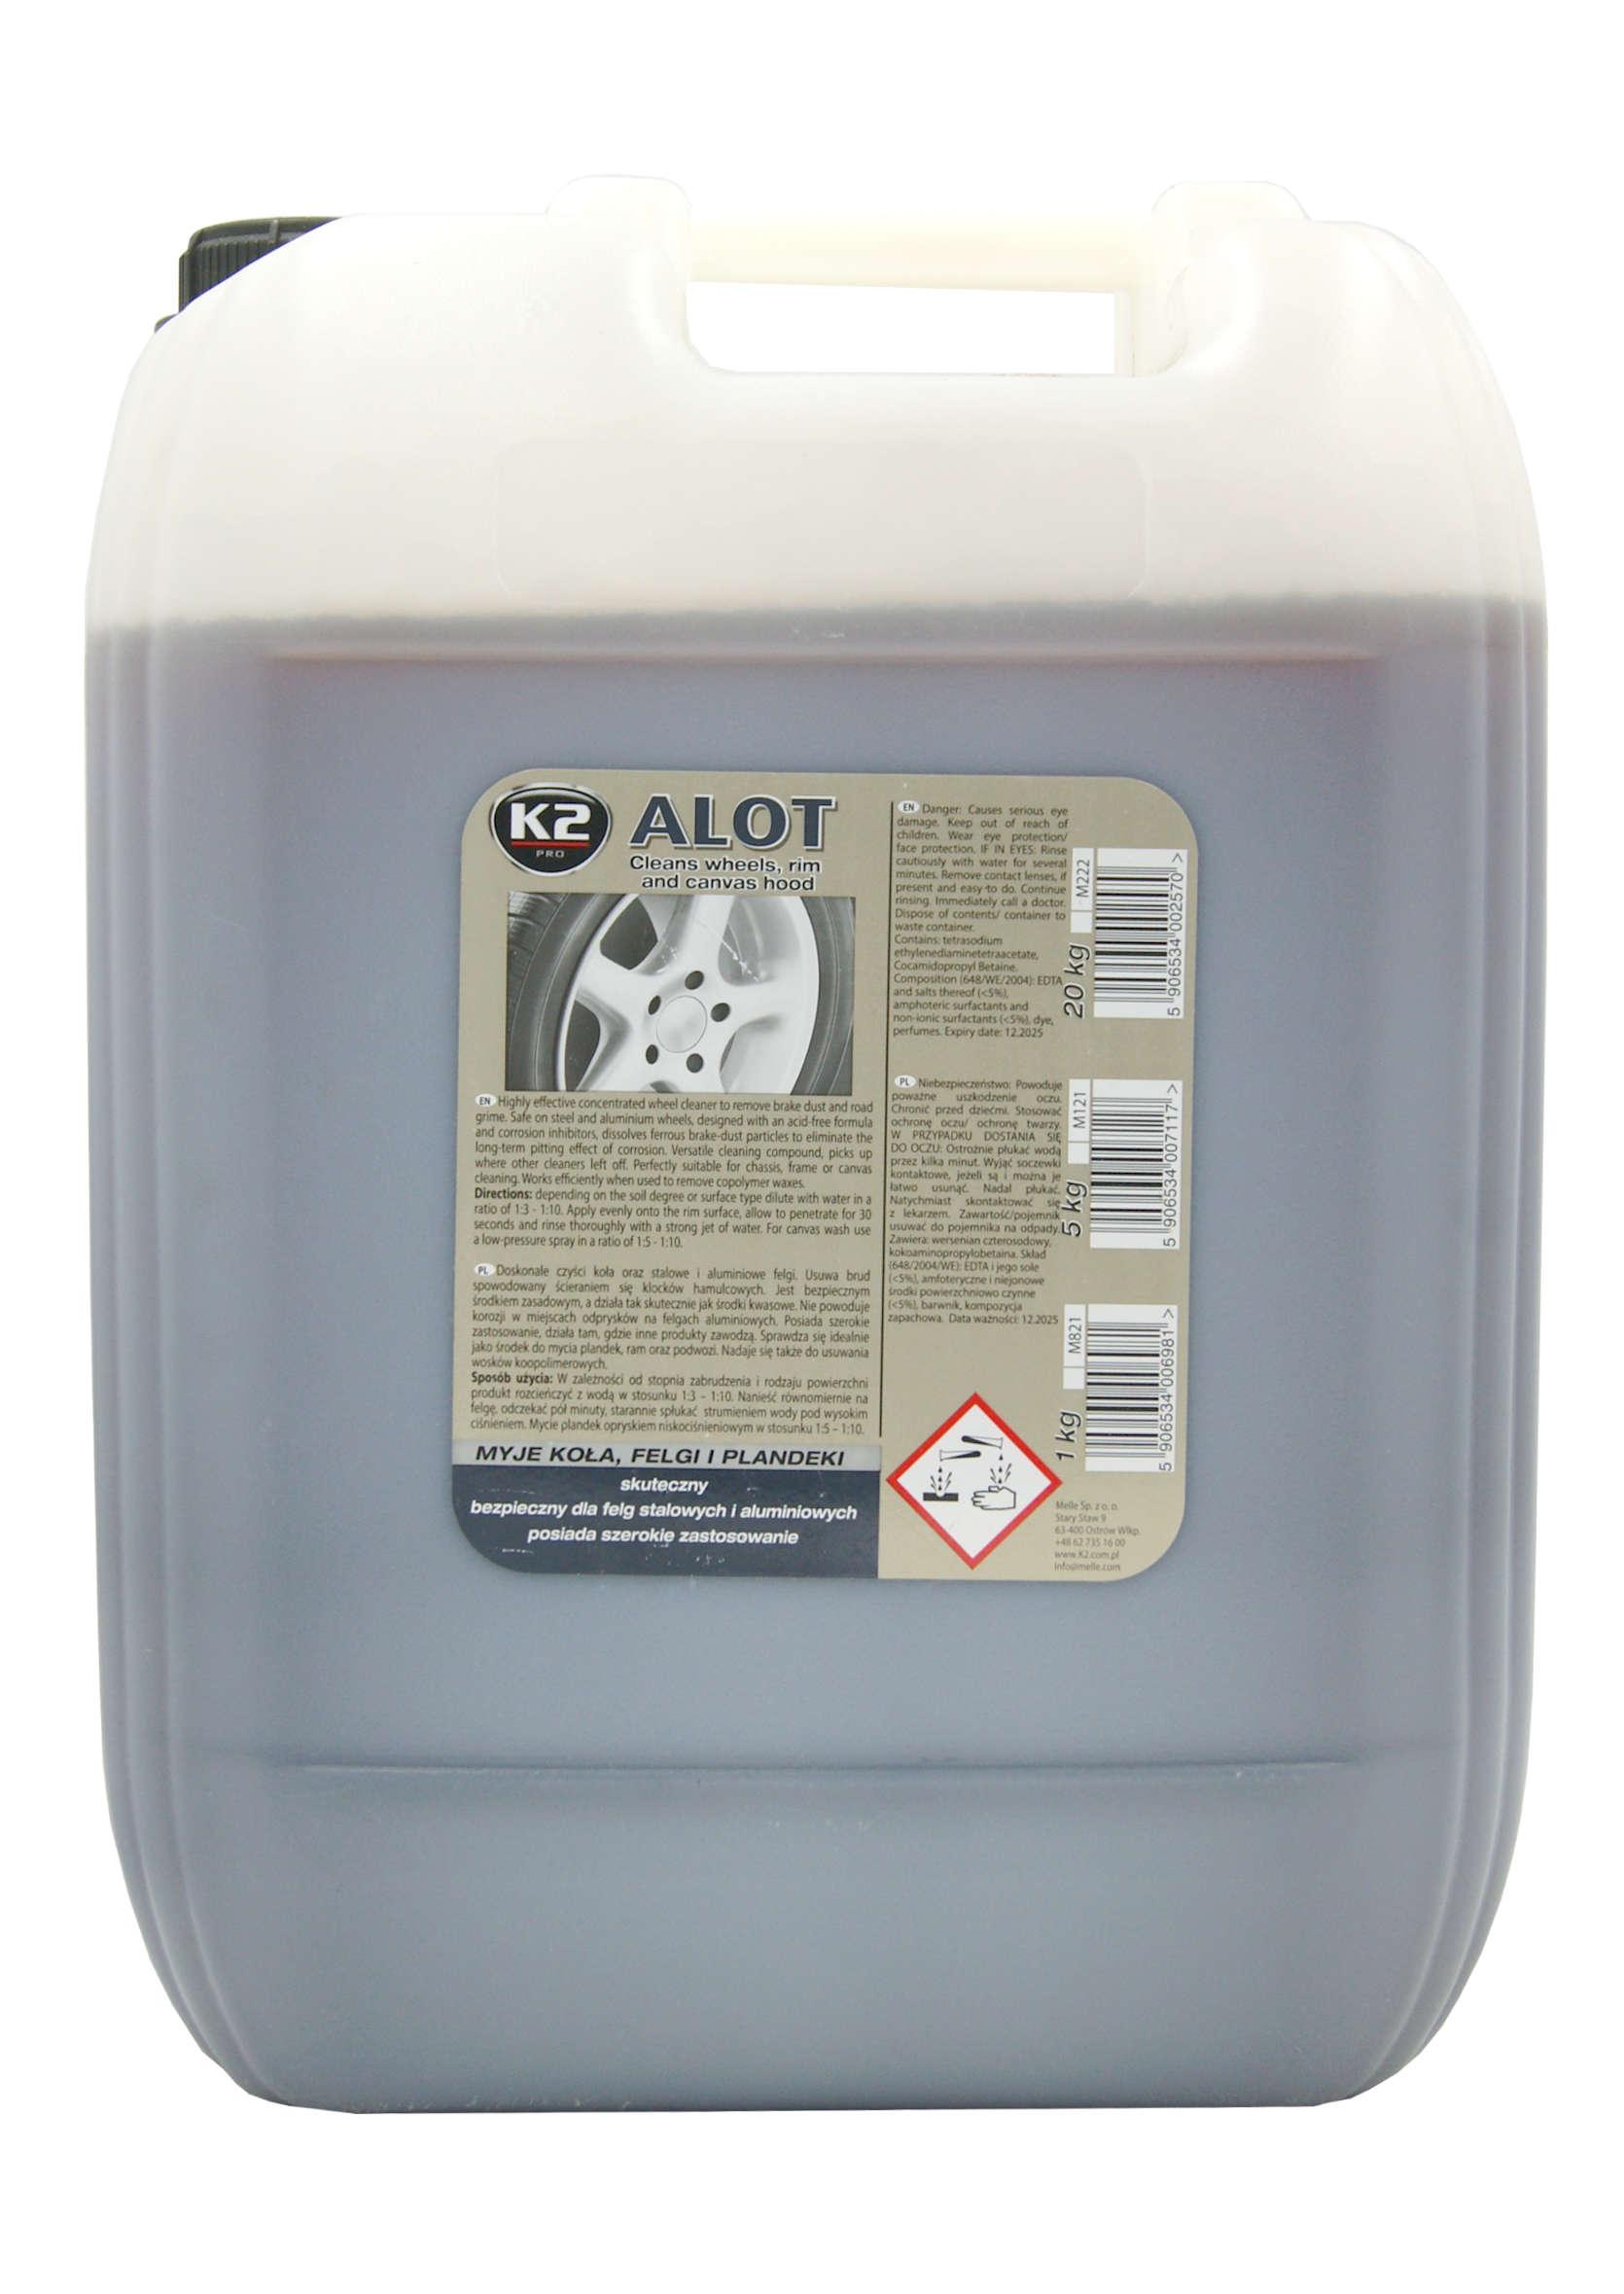 Środek do Mycia Felg i Plandek K2 Pro Alot 20 Kg